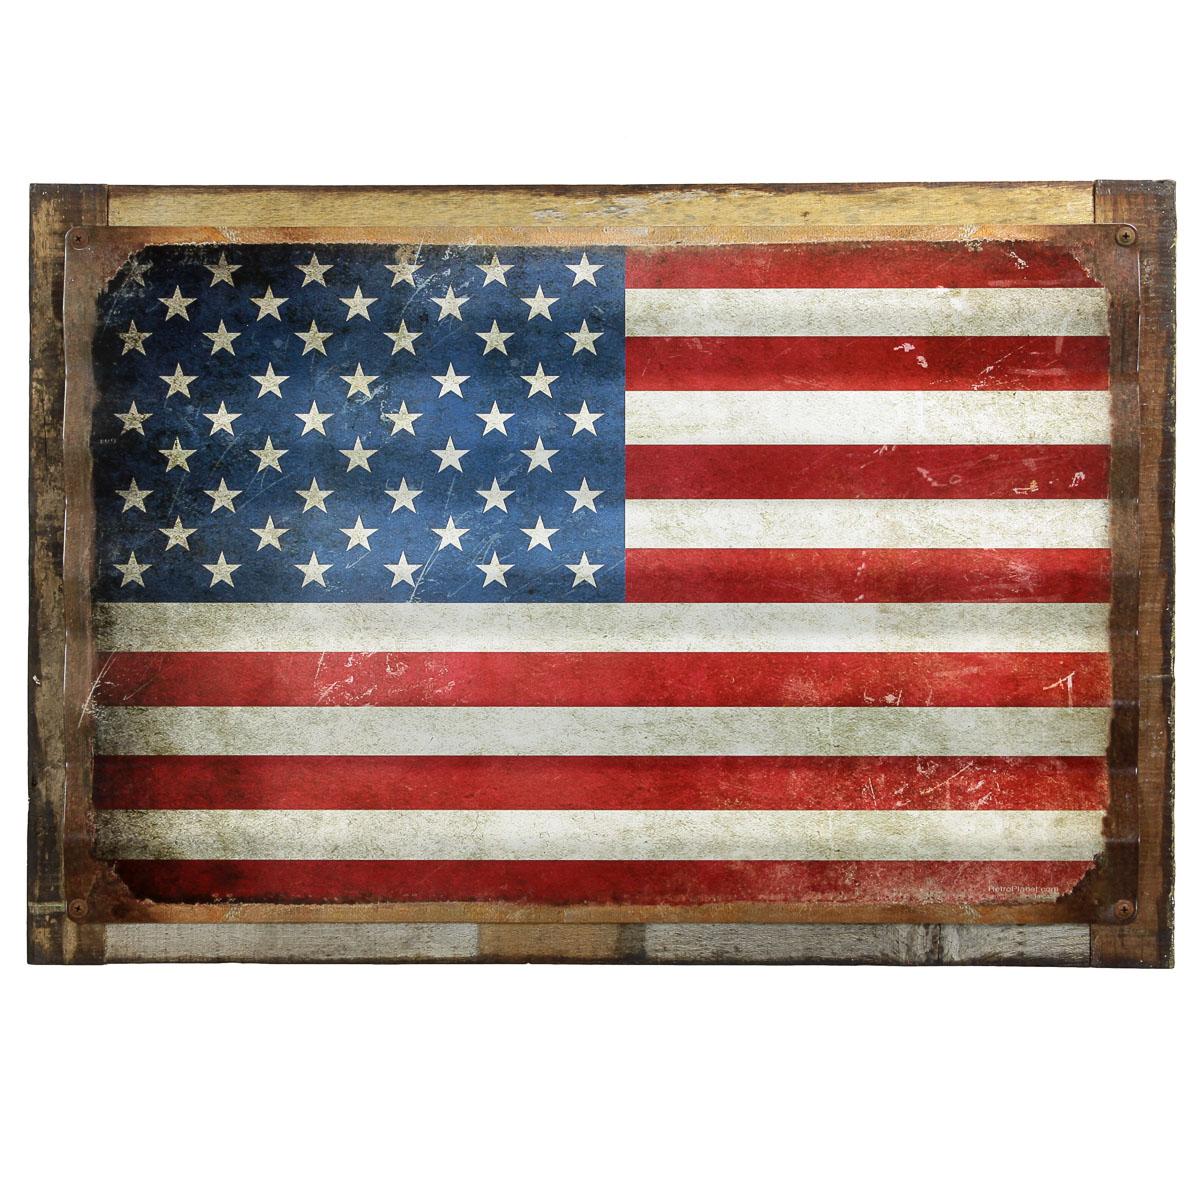 ed646657cc37 American Flag Distressed Framed Corrugated Metal Sign Patriotic Decor 26 x  18